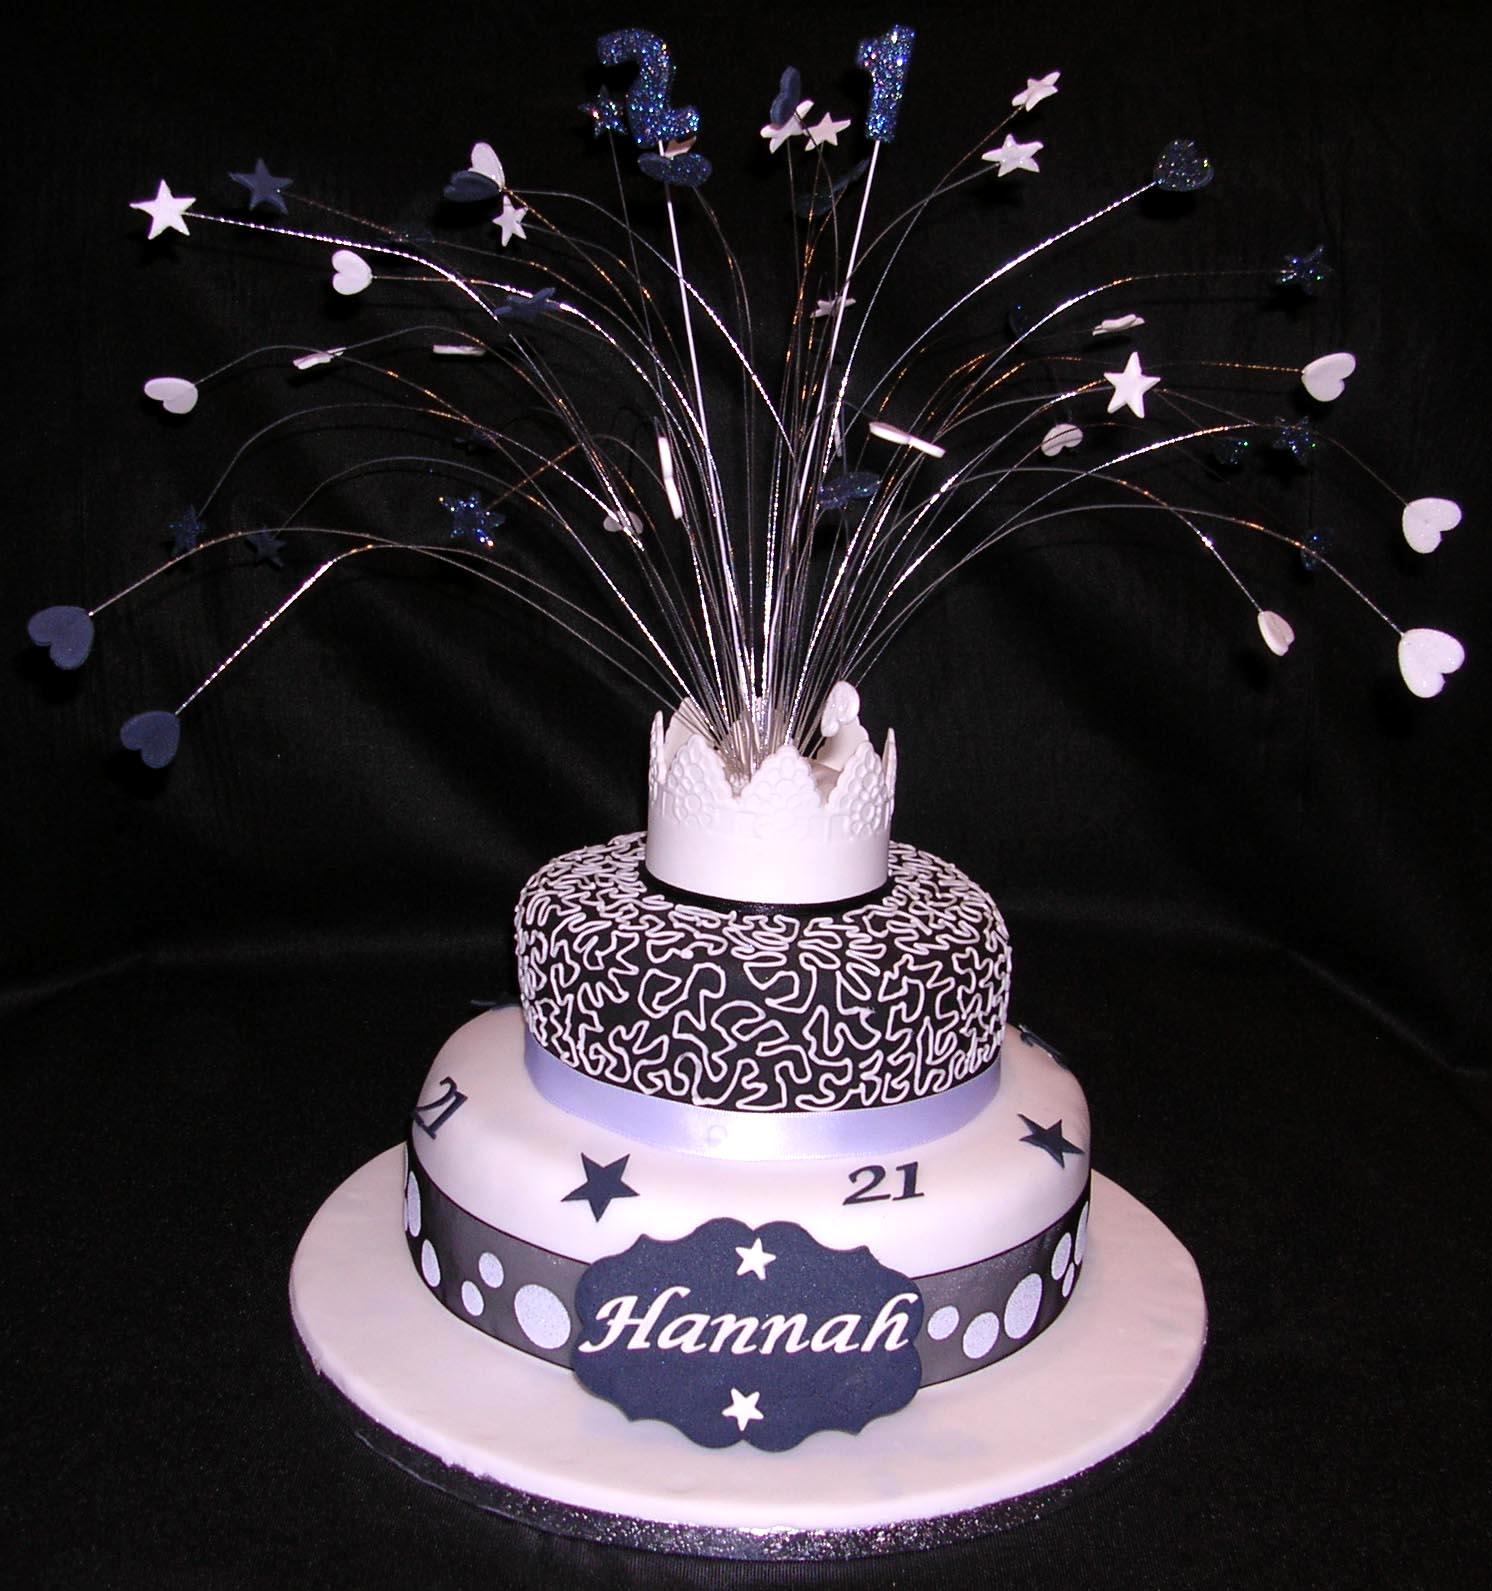 special 21st birthday cakes trend made birthday cakes ideas